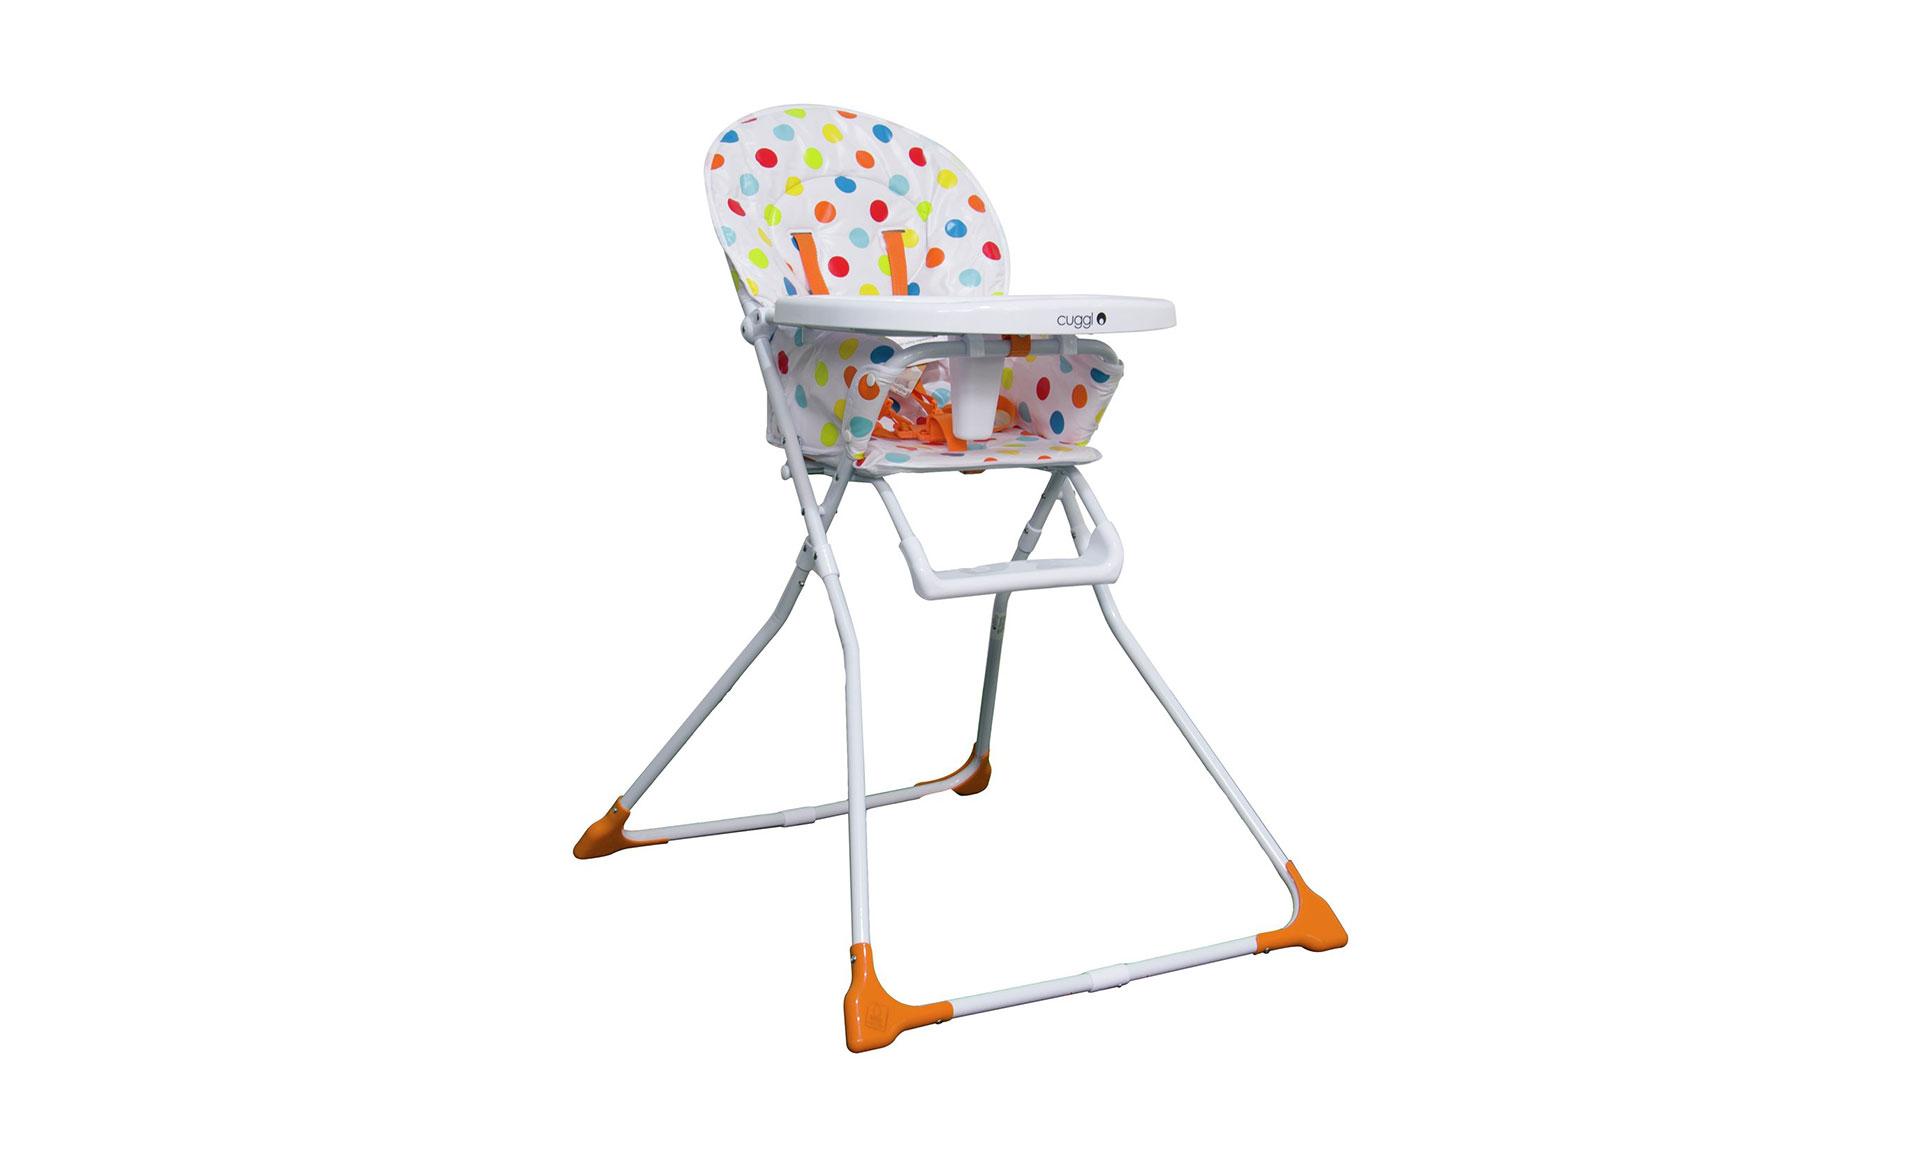 safety alert: argos cuggl mushroom high chair recalled